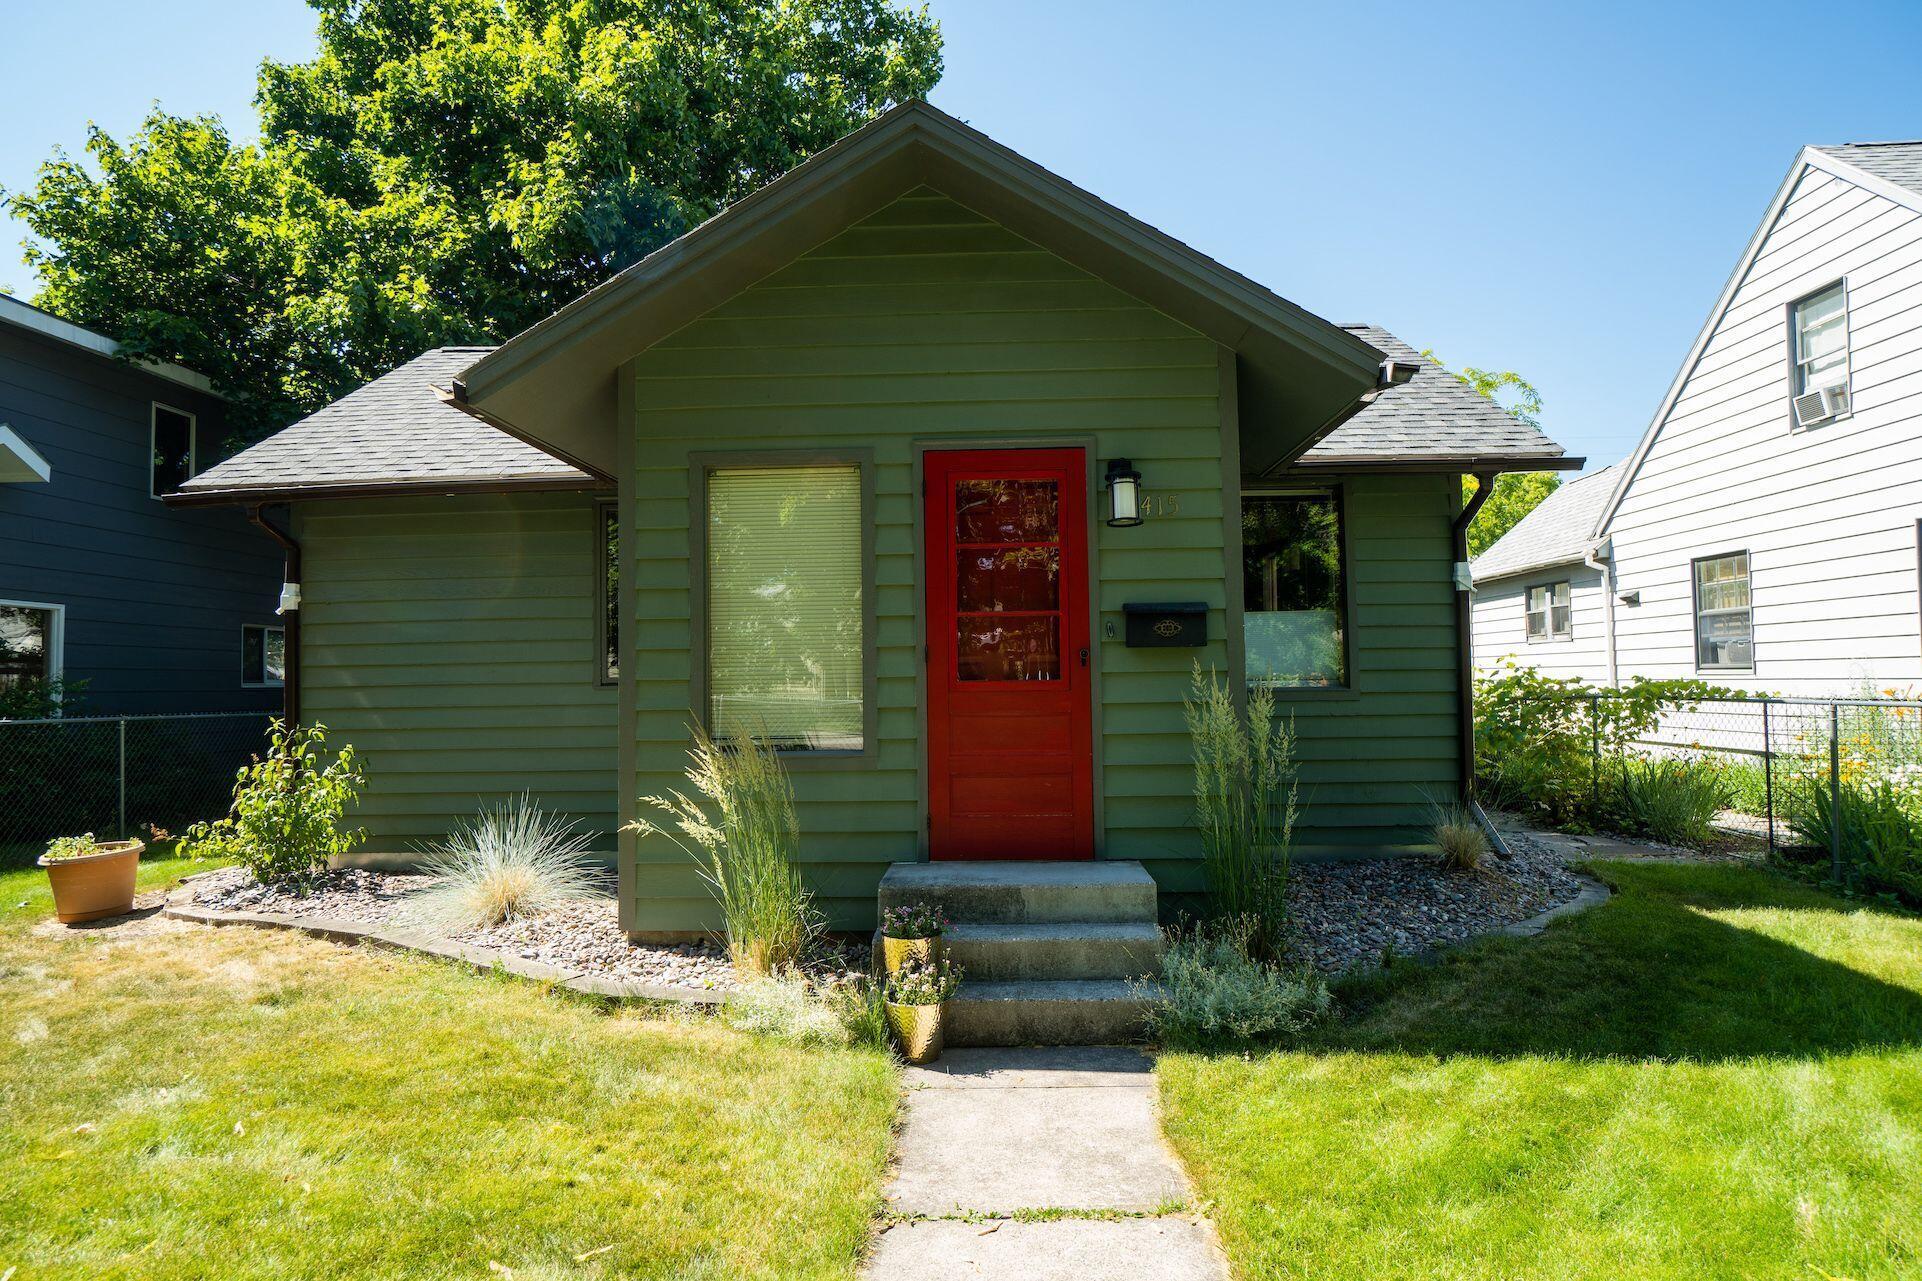 415 Edith Street, Missoula, MT 59801